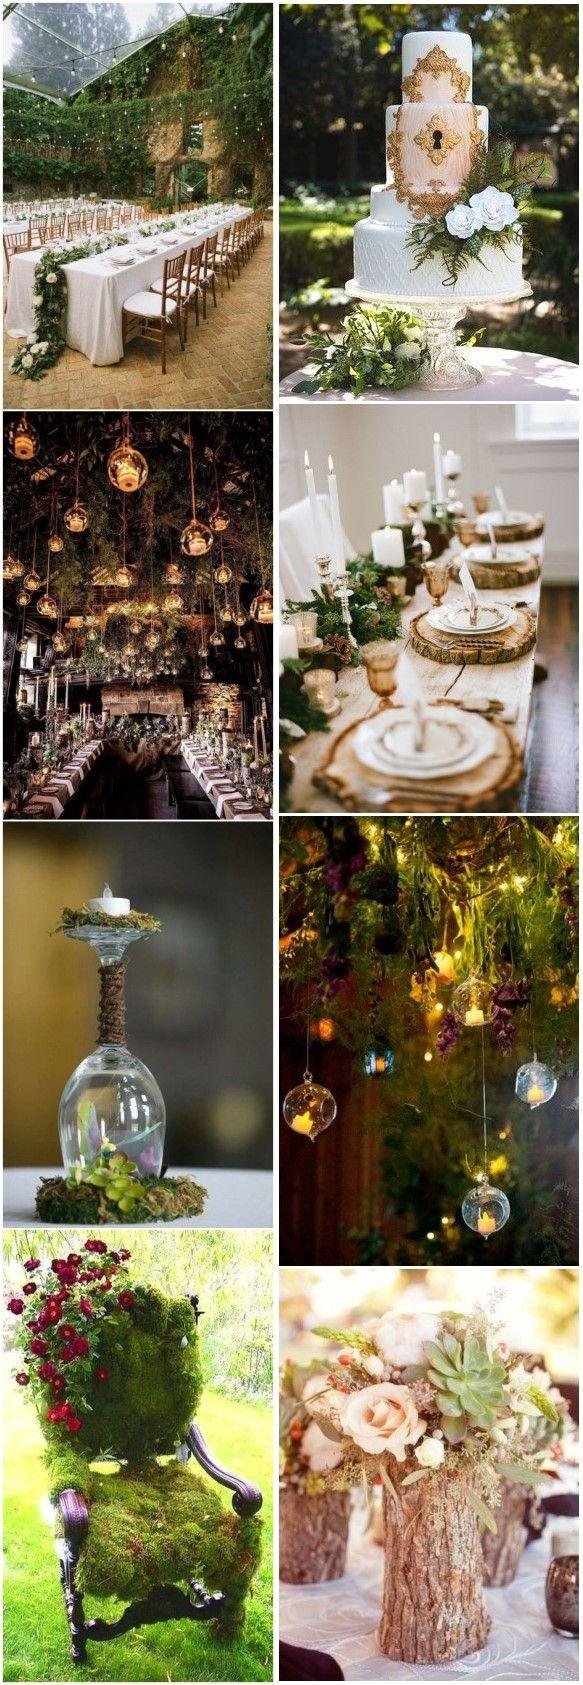 0abbcc36dfc 20+ Enchanted Forest Wedding Themed Ideas  weddings